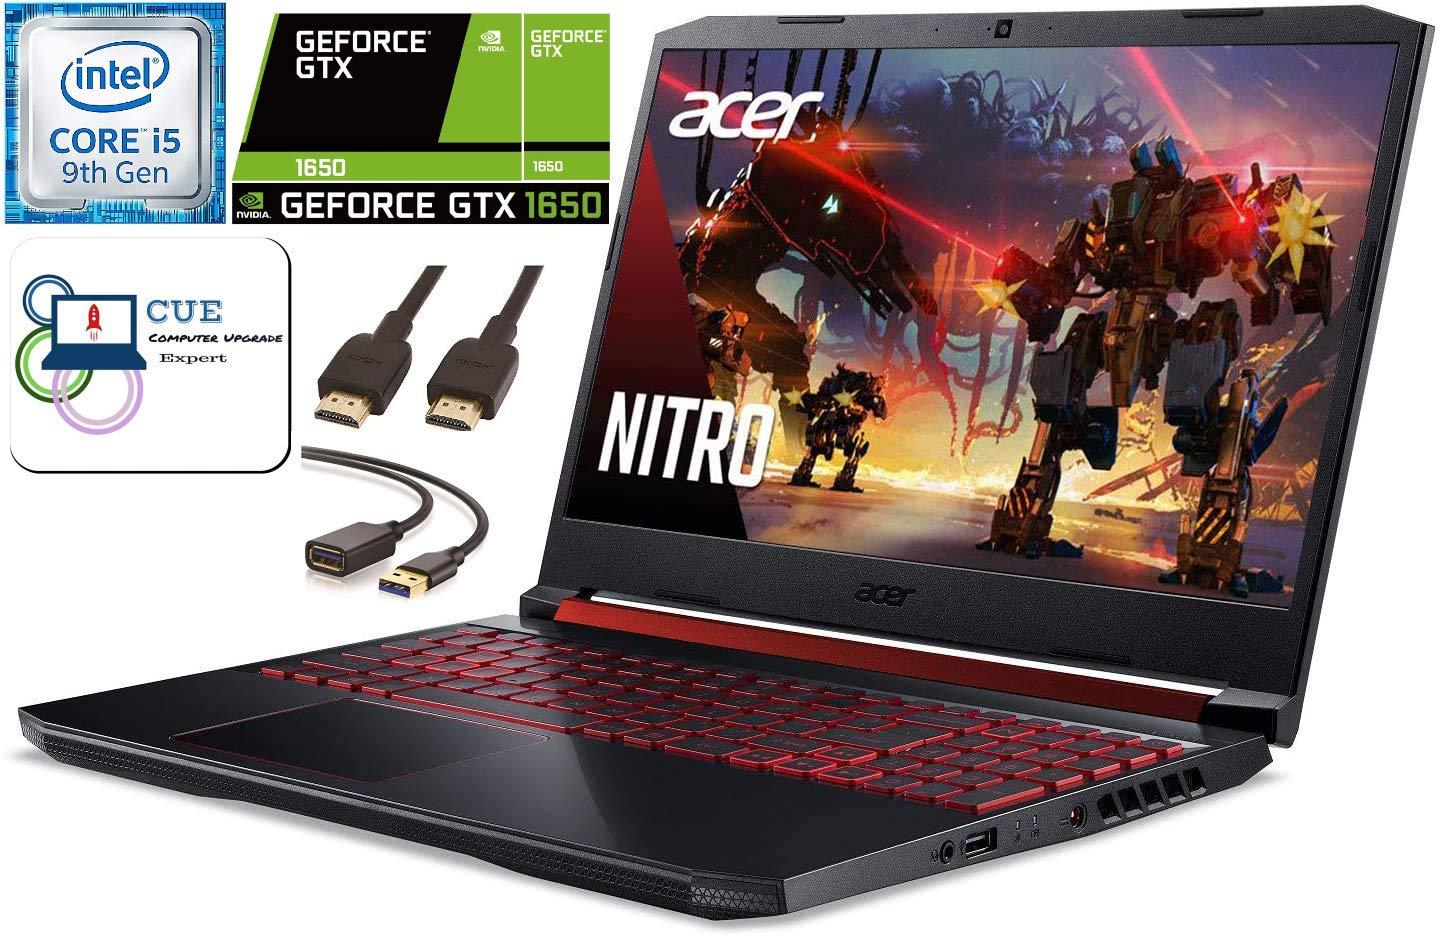 Acer Nitro 5 15.6 FHD Gaming Laptop, 9th Gen Intel Quad Core i5-9300H, 16GB DDR4 RAM, 256GB NVMe SSD, NVIDIA GeForce GTX 1650, Backlit Keyboard, WiFi 6, MaxxAudio, Windows 10 + CUE Accessories